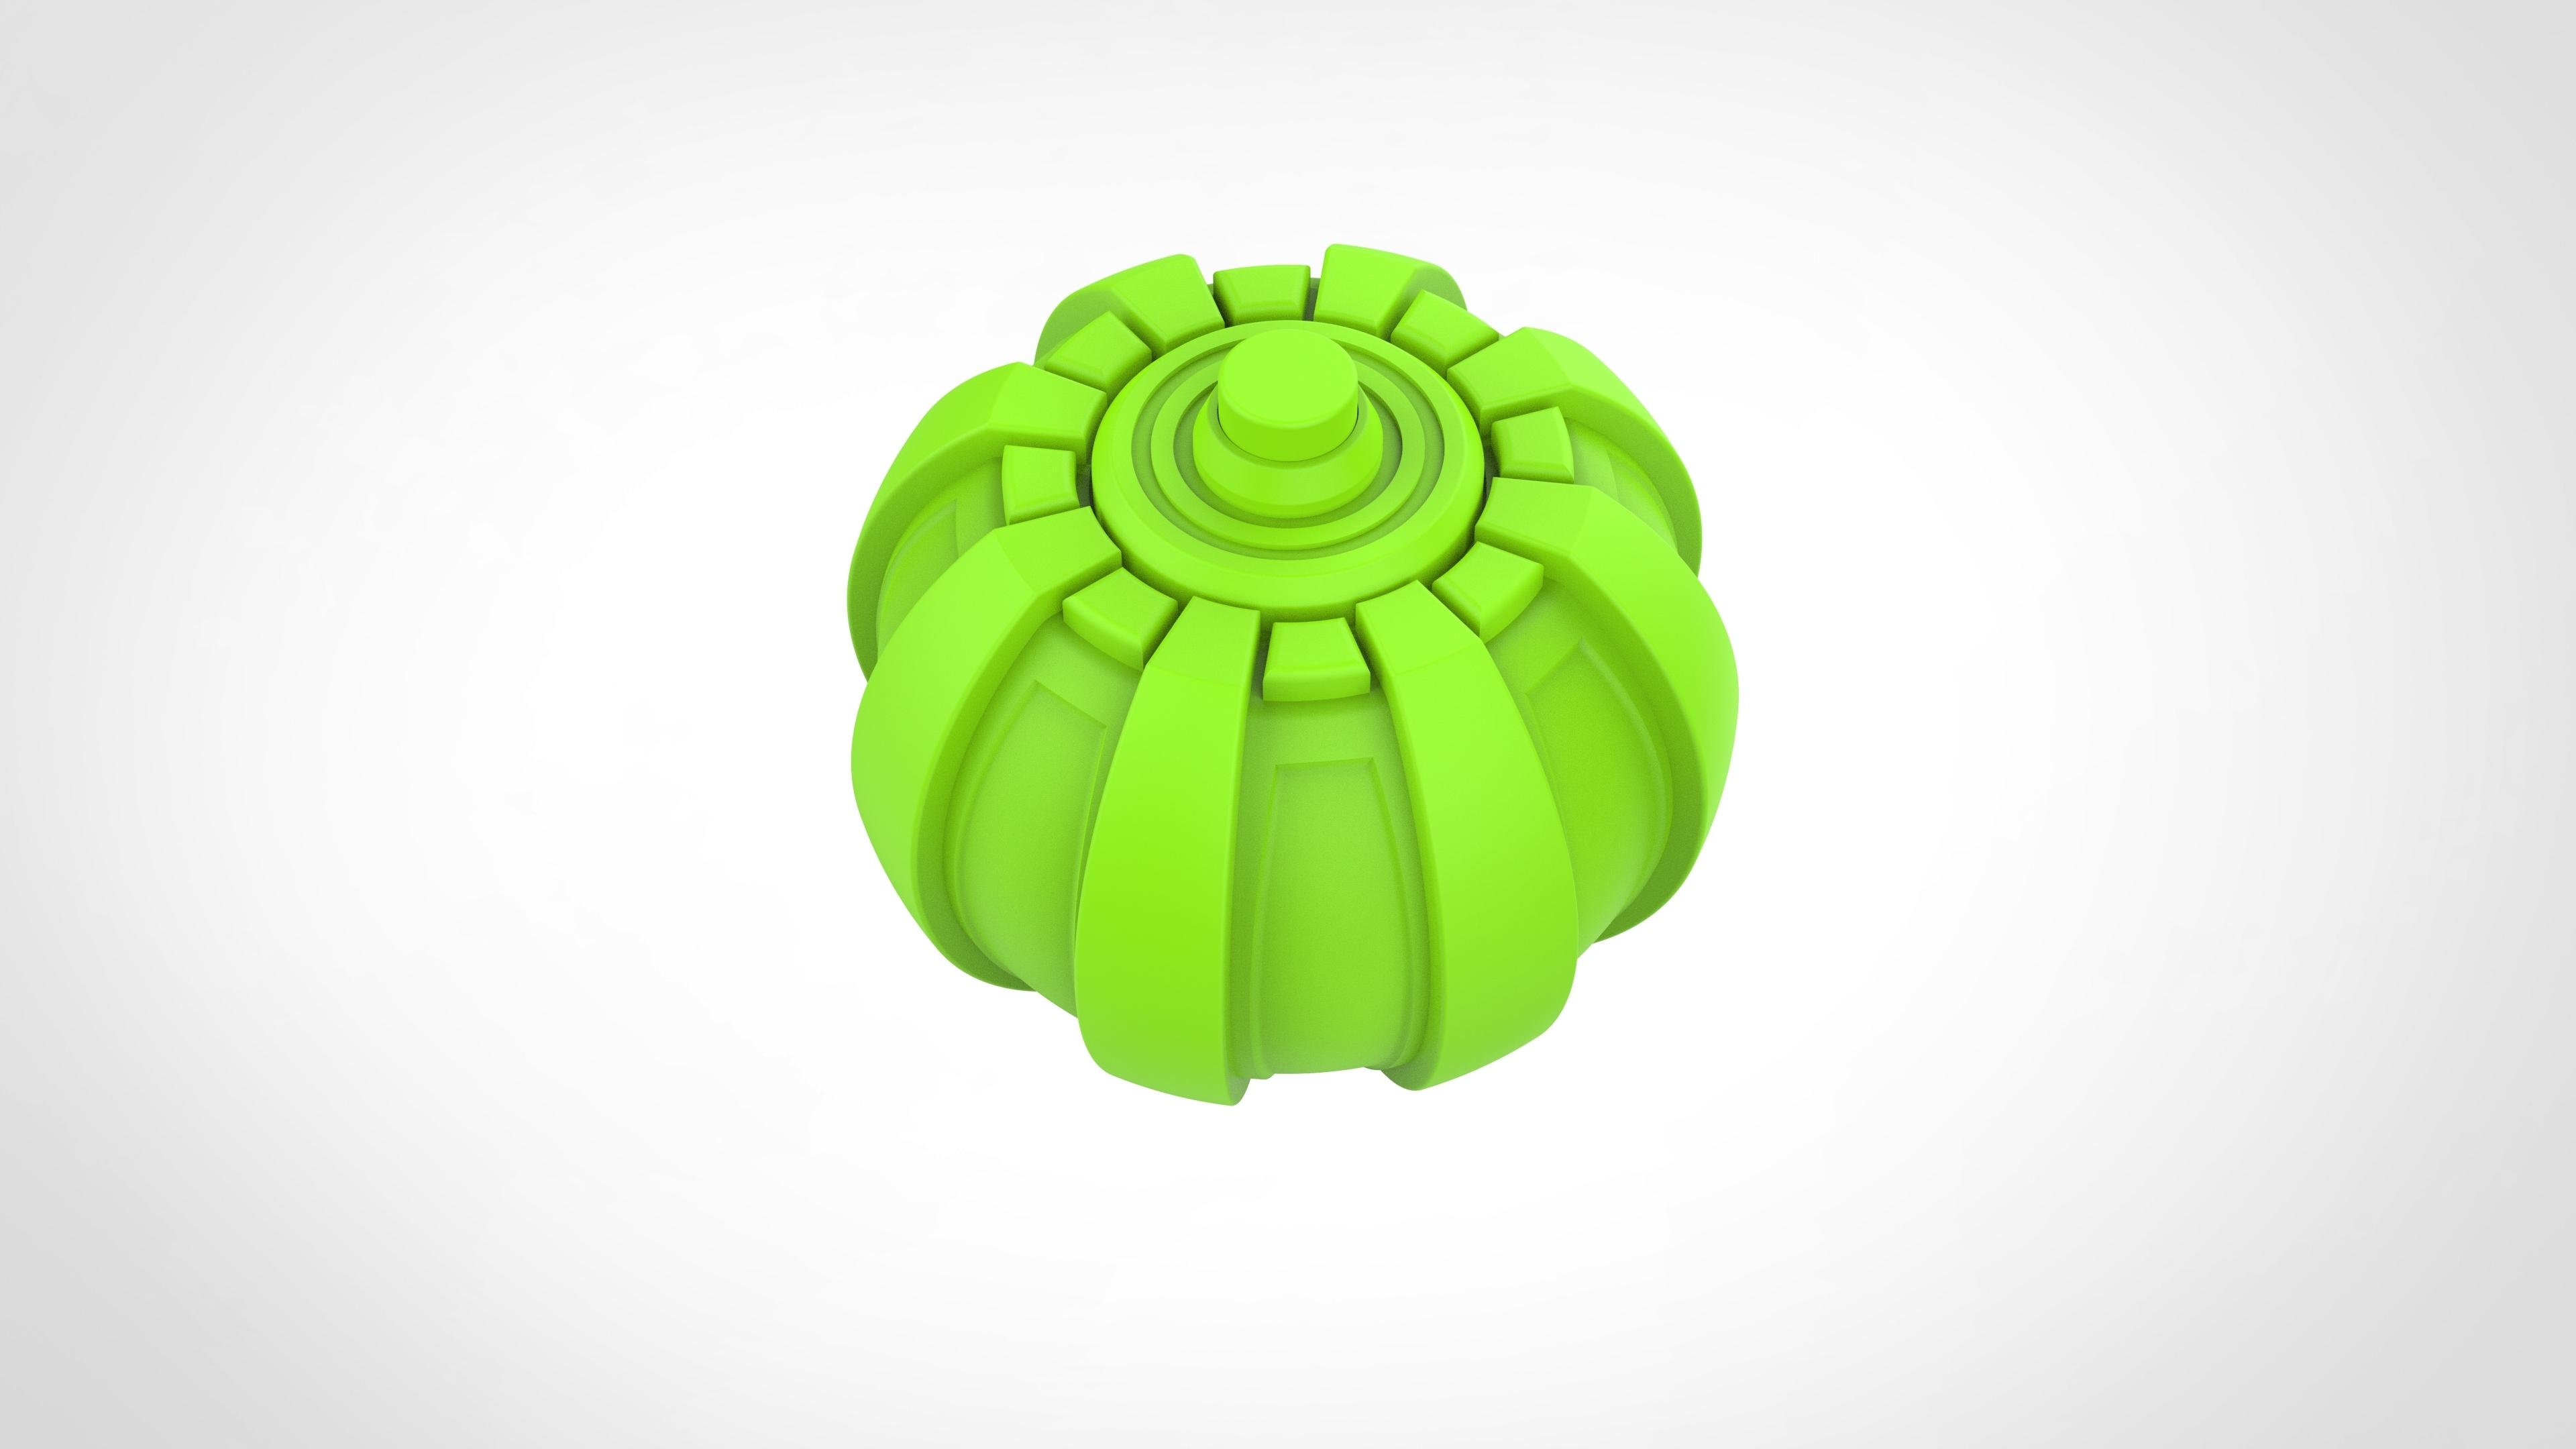 024.jpg Download 3MF file Green goblin bombs from the Spide-Man comics • 3D print model, vetrock